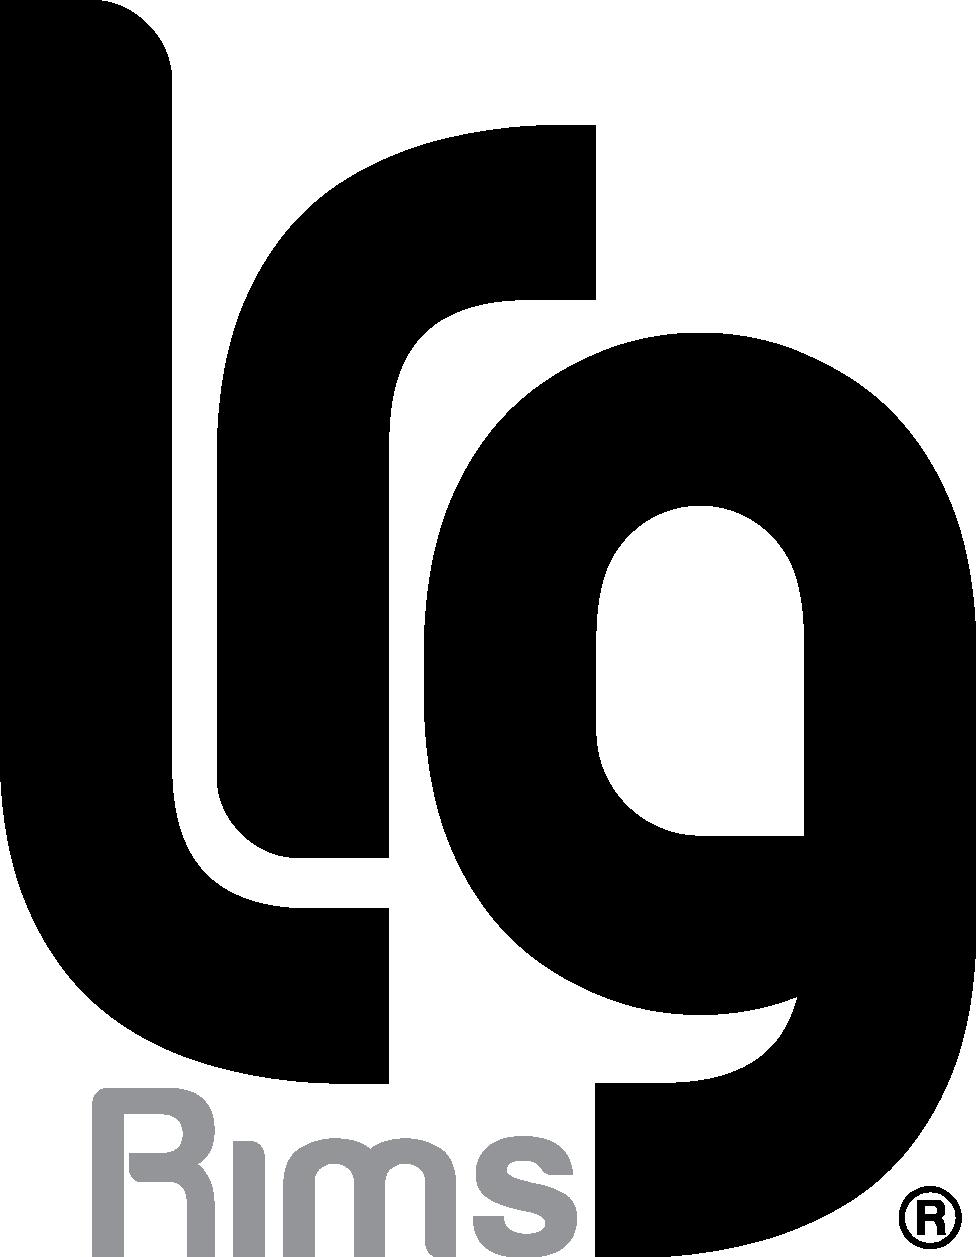 Copy of LRG Rims